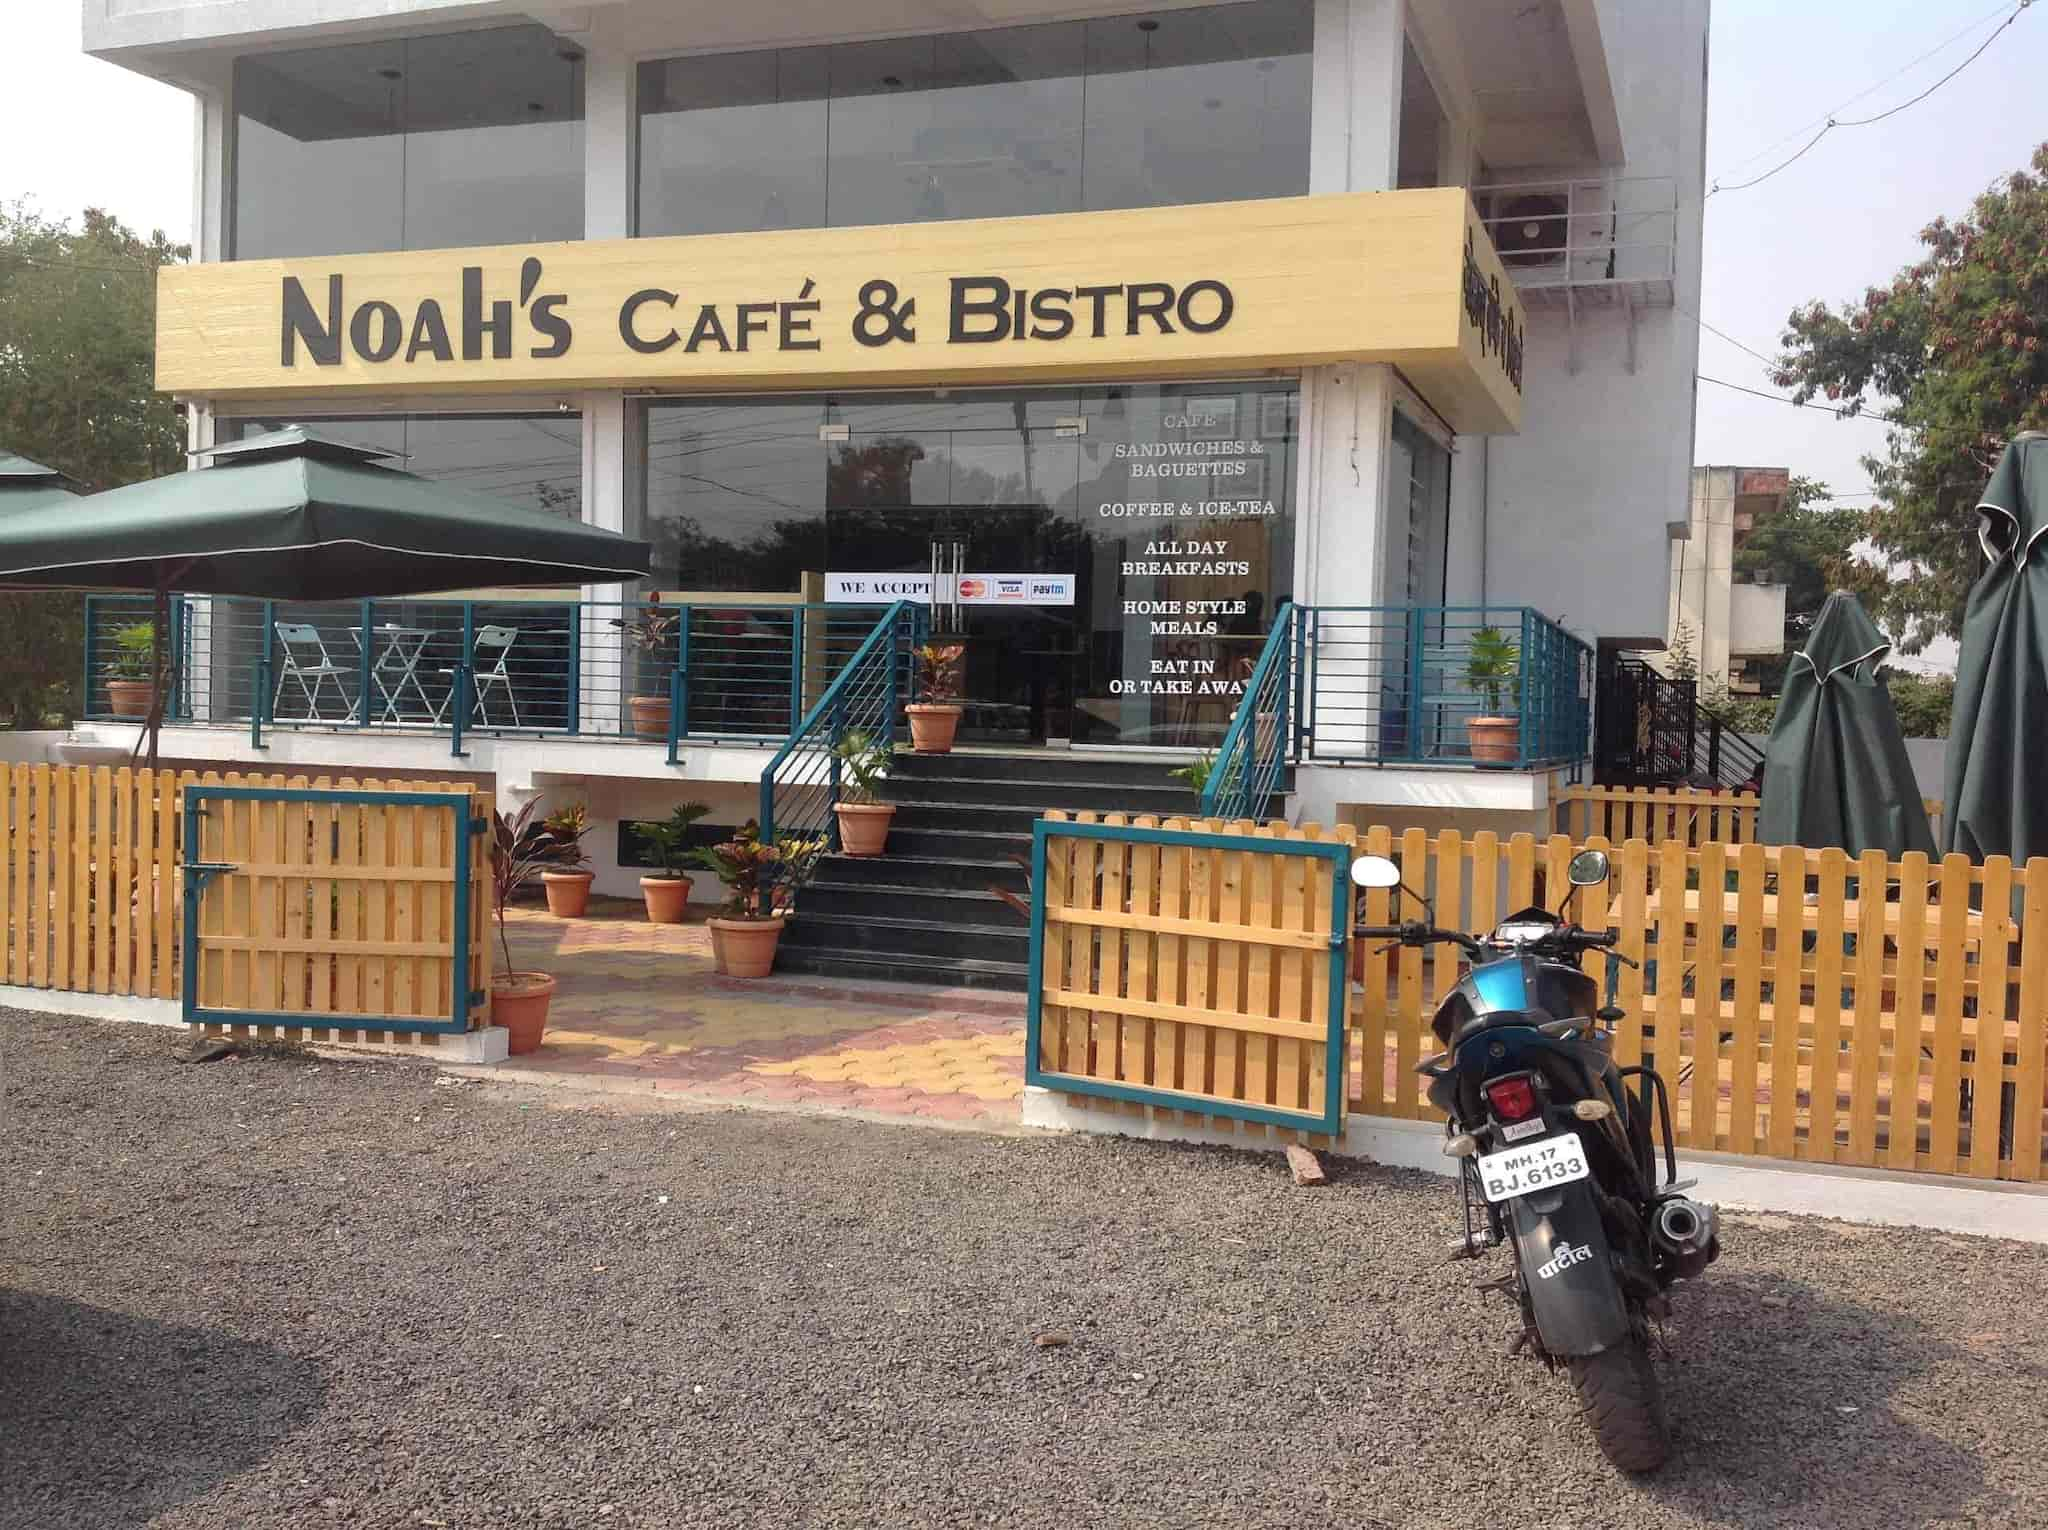 Cafe Noah noahs cafe and bistro savedi ahmednagar fast food justdial